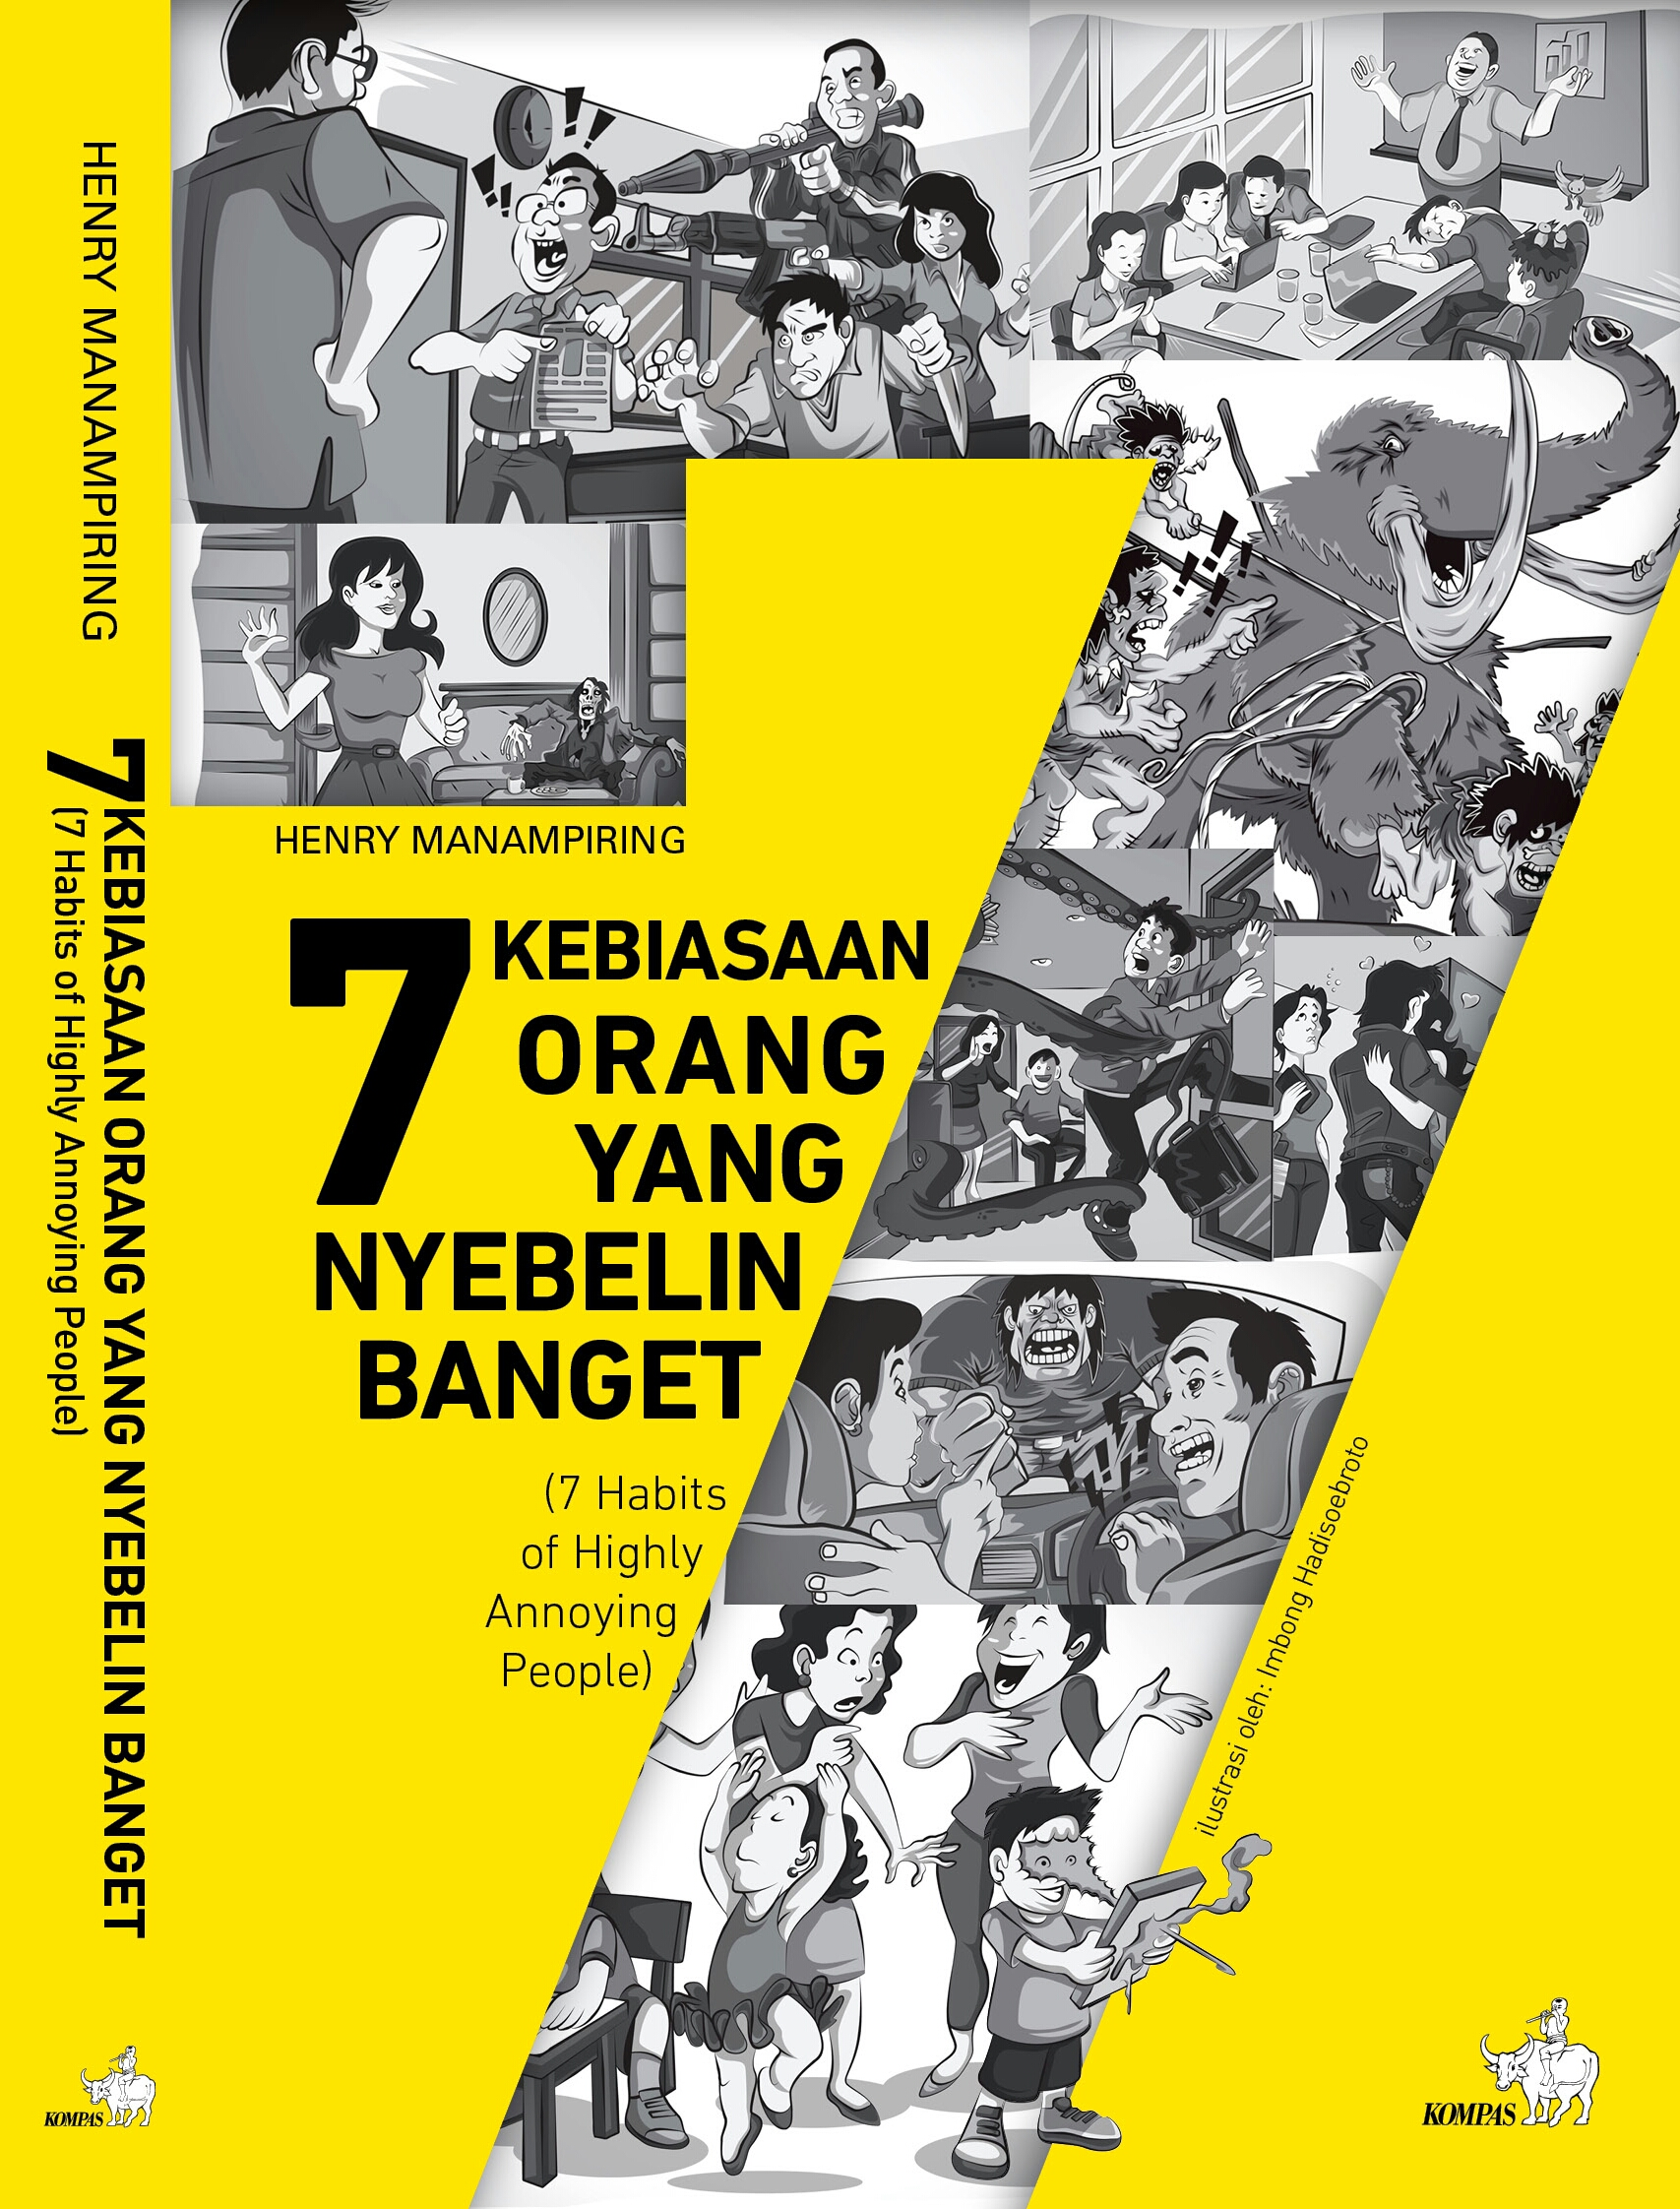 Resensi Buku 7 Kebiasaan Orang Yang Nyeblin Banget (7 Habits of Highly Annoying People)